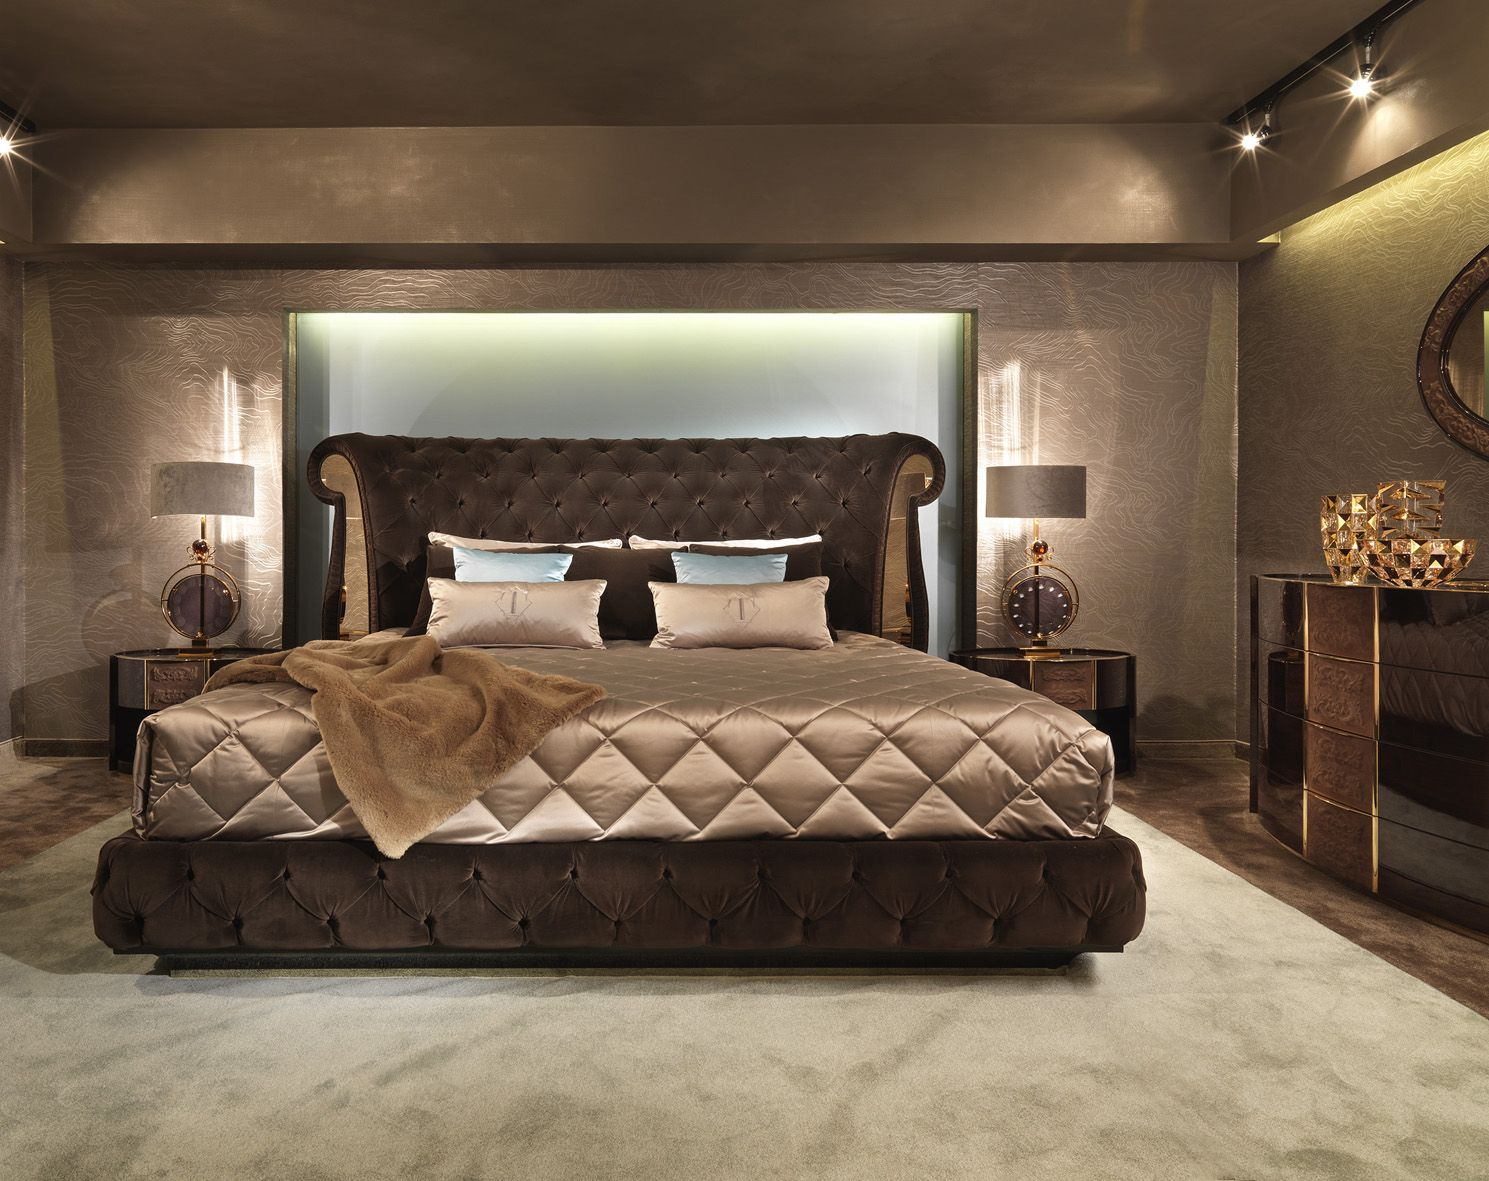 italian luxury bedroom furniture.  Bedroom Couture Bedroom Wwwturriit Italian Luxury Bed Luxury Luxuryfurniture  Bedroom Luxuryhome Madeinitaly Homedesign Interiordesign Intended Luxury Furniture R